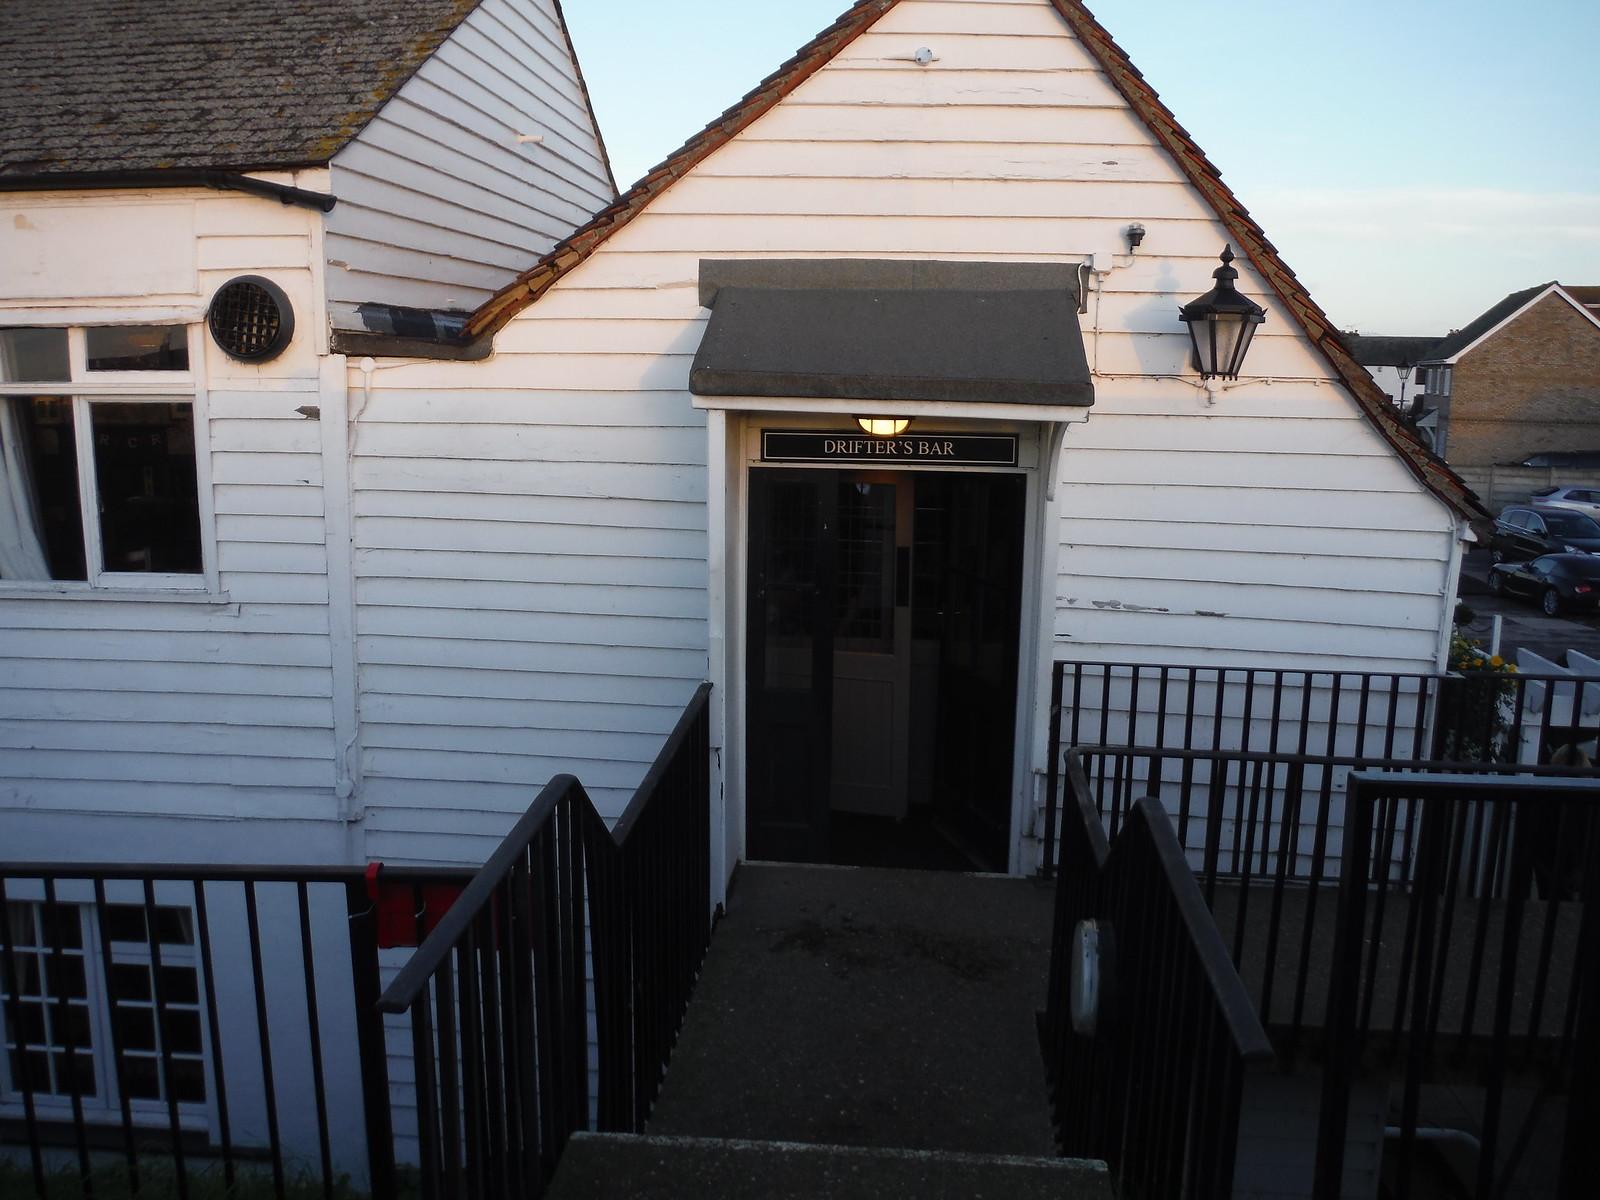 Entrance to the Drifter's Bar, Lobster Smack Inn, Canvey Island SWC Walk 258 Benfleet Circular (via Canvey Island)